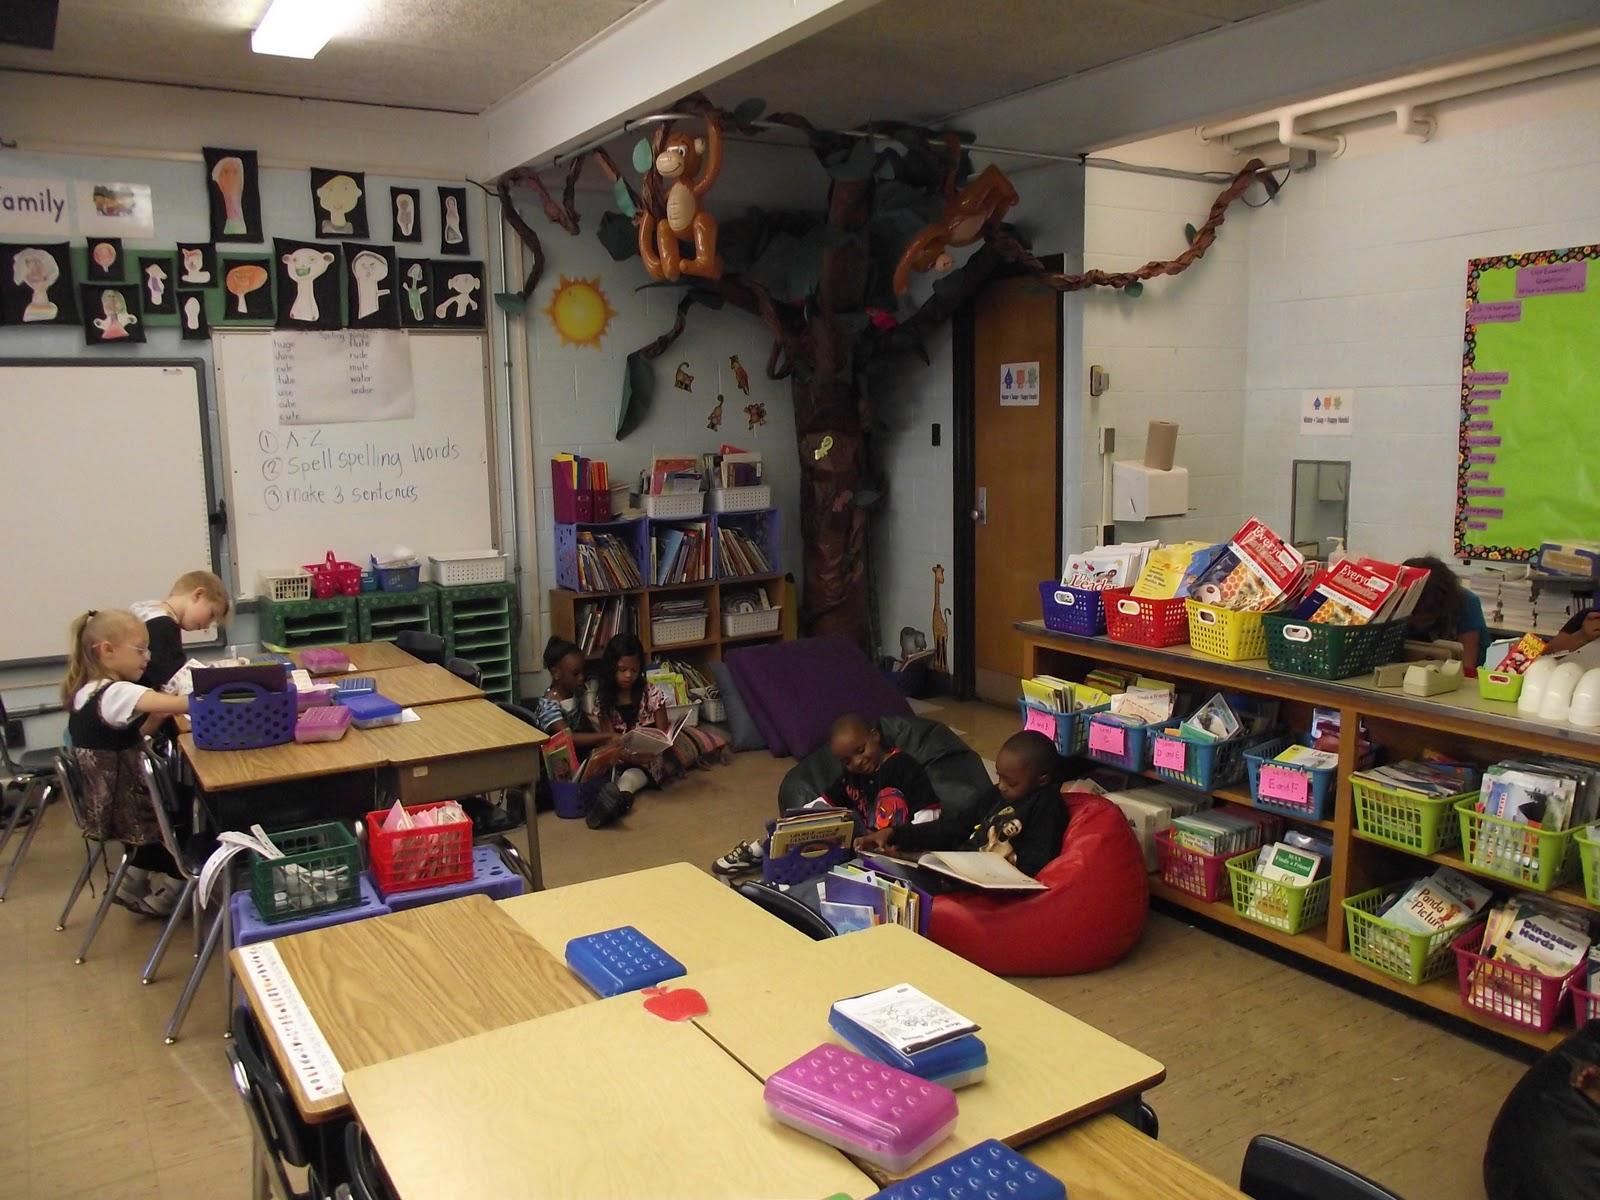 egitimteknolojinet_classroom_decoration (13)